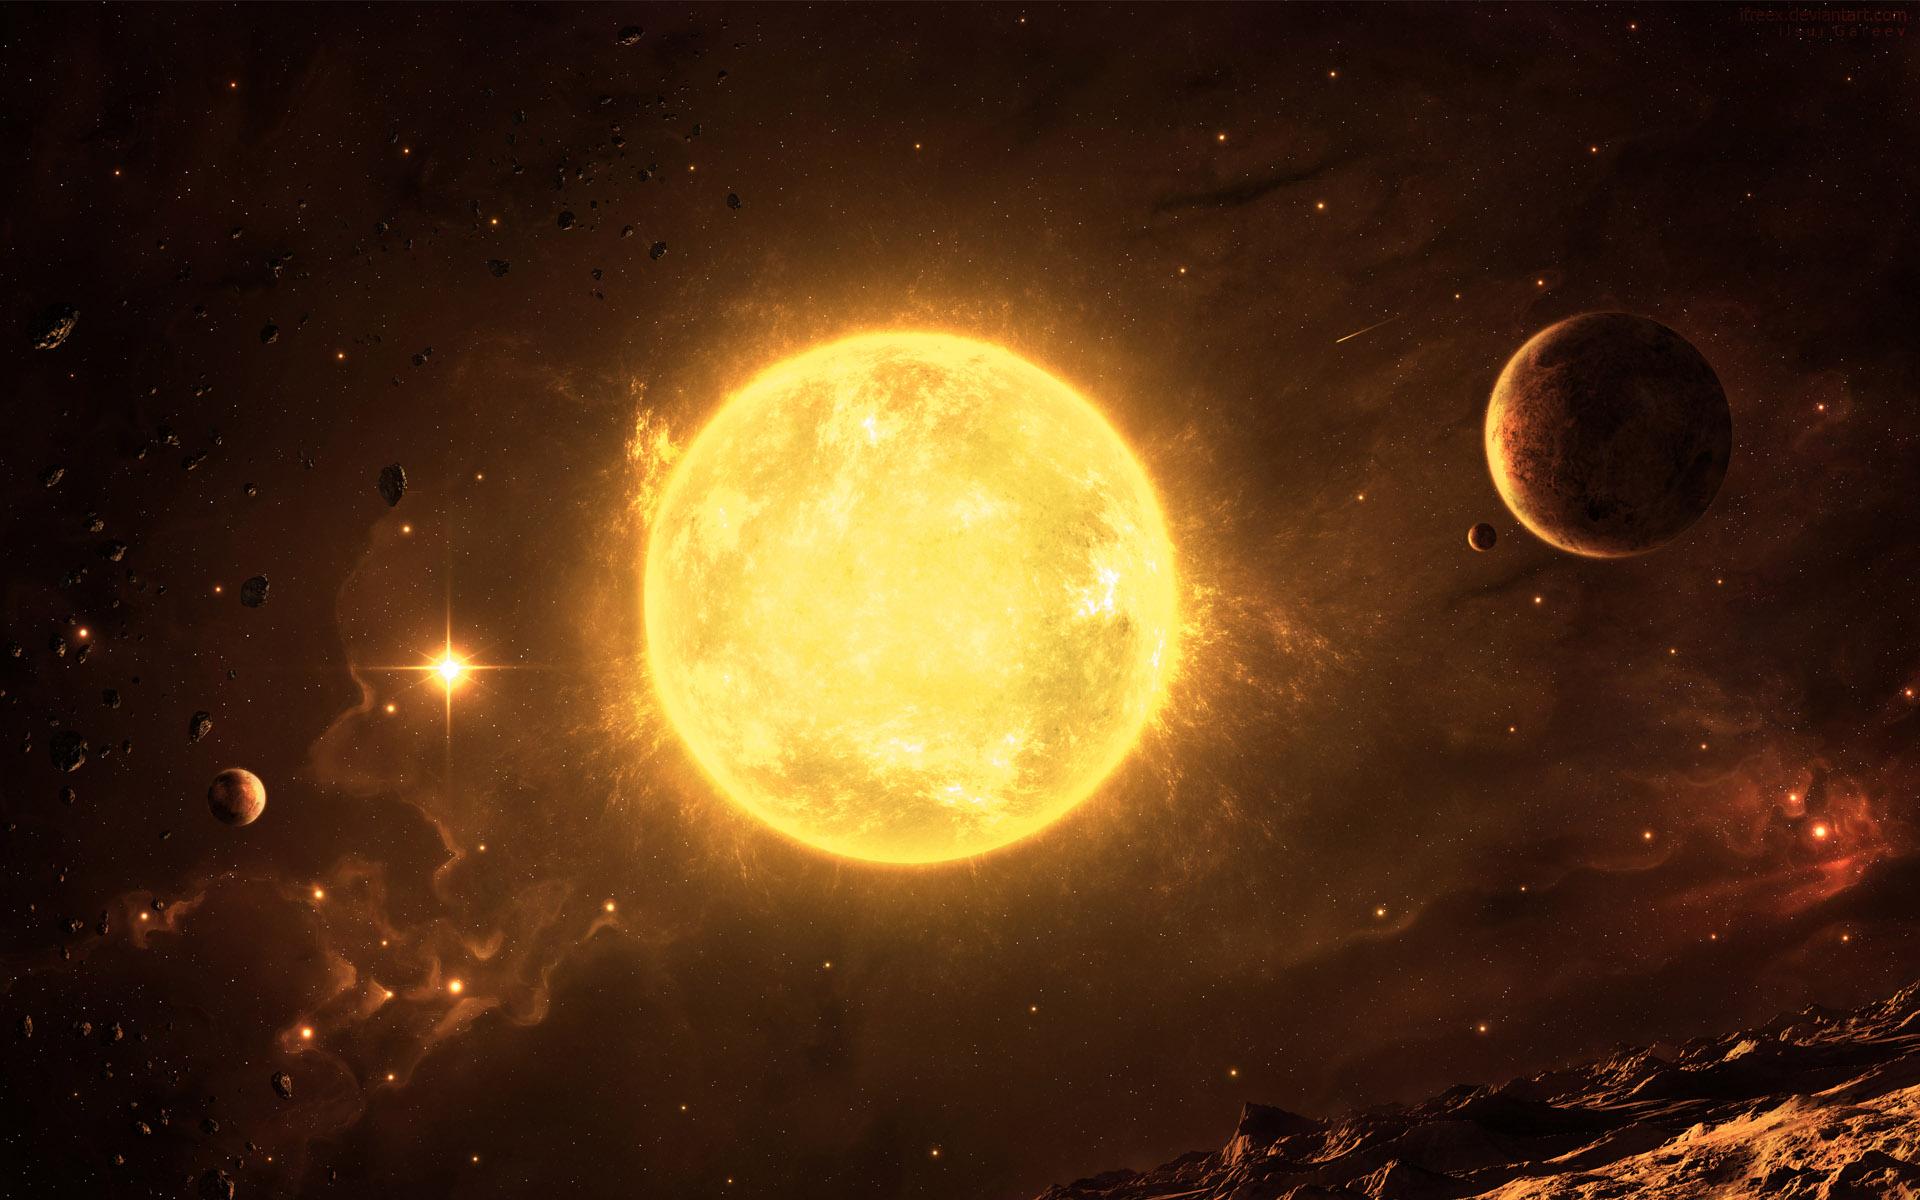 Метро, картинки на тему солнце